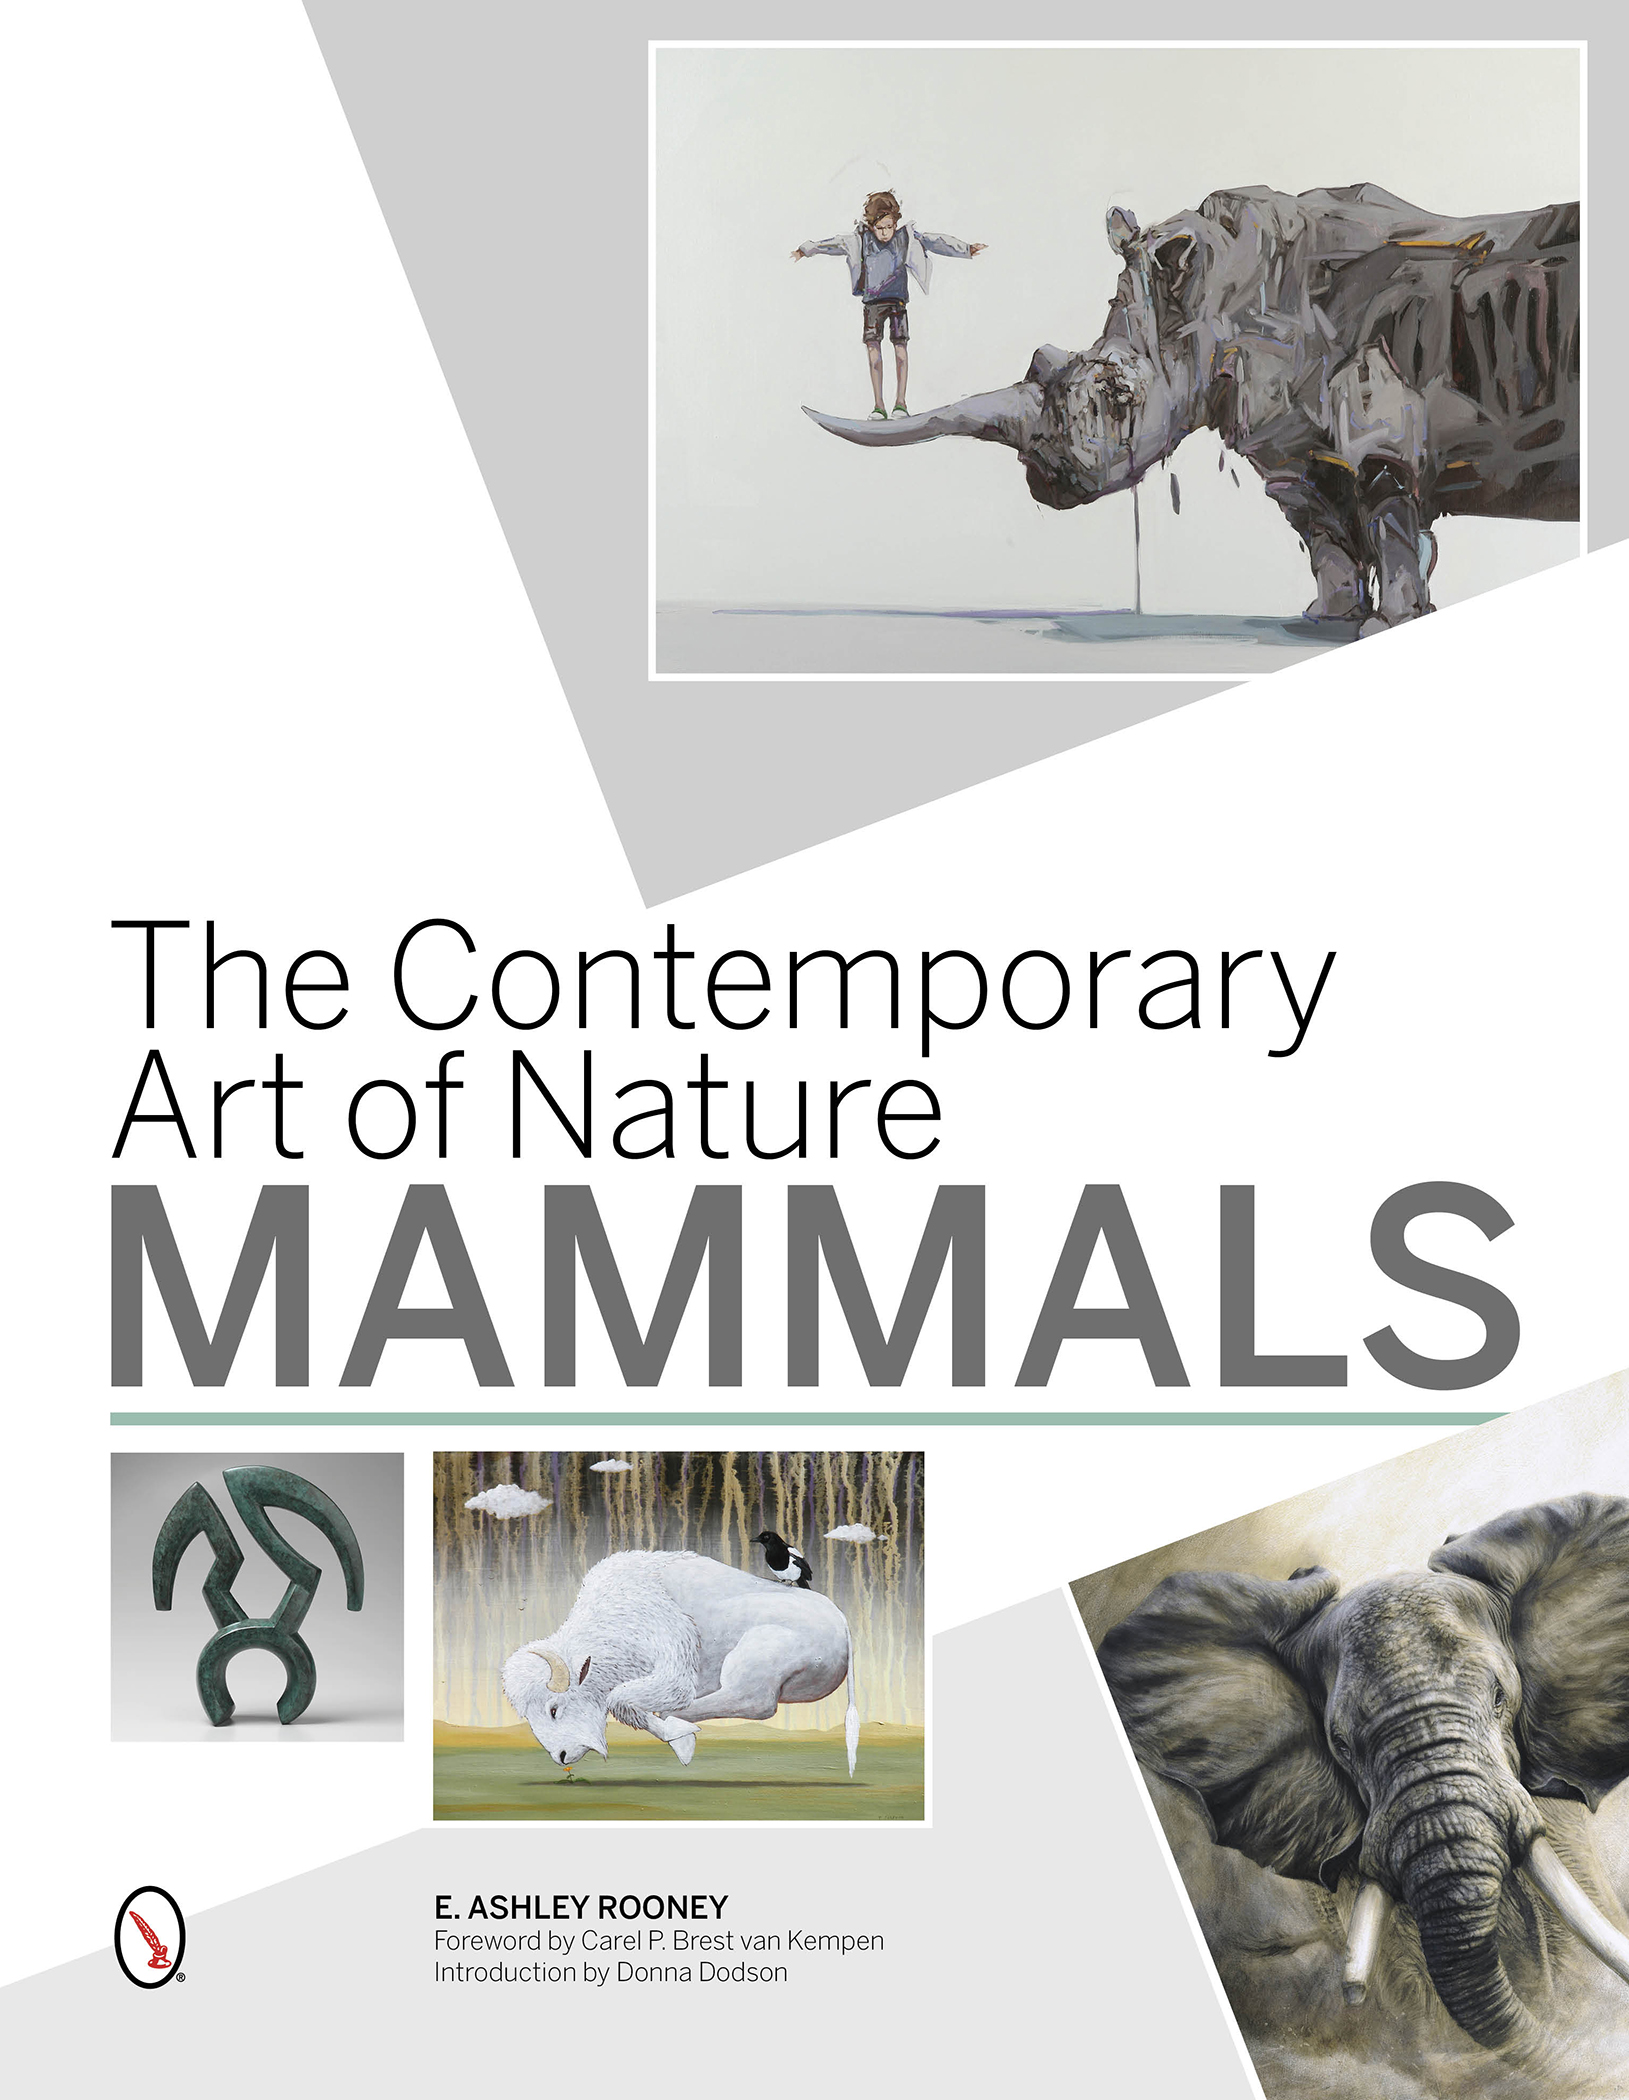 The Contemporary Art of Nature: MAMMALS